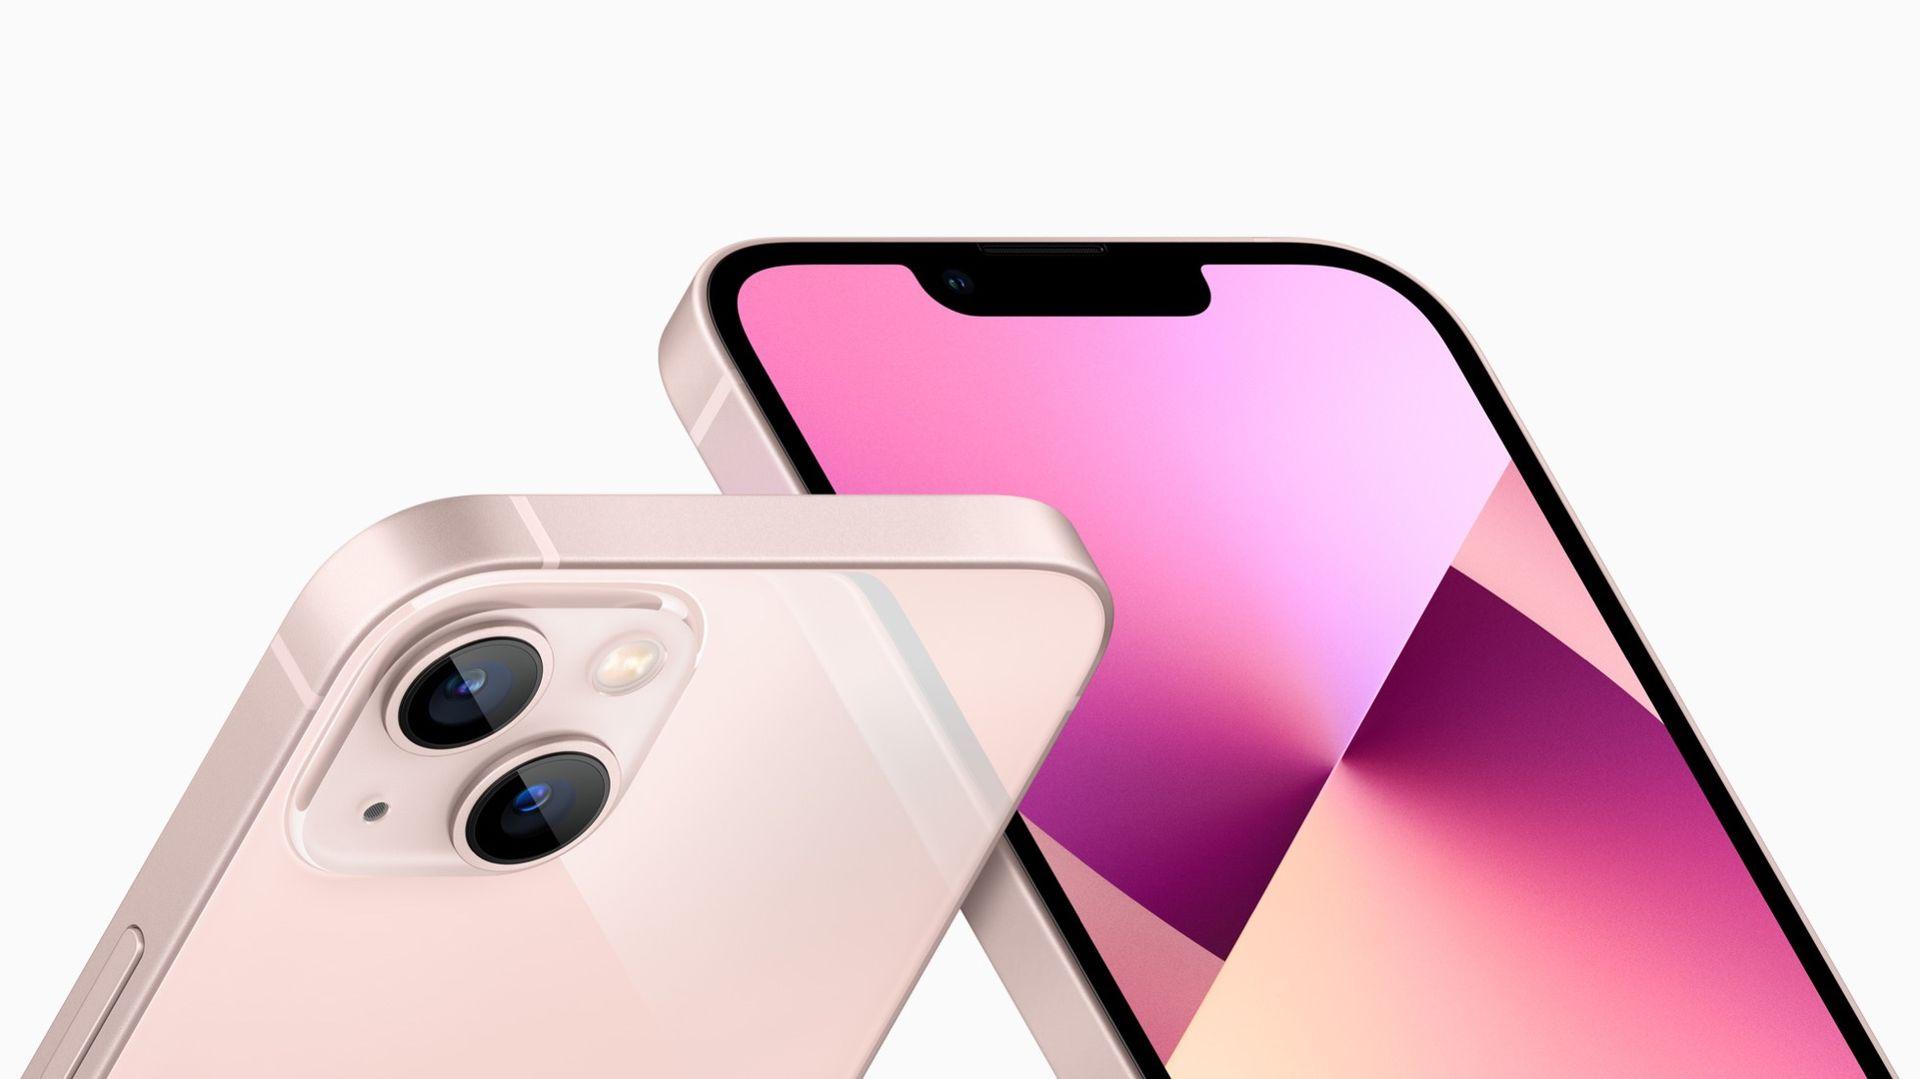 Apple introducerar iPhone 13 och 13 mini